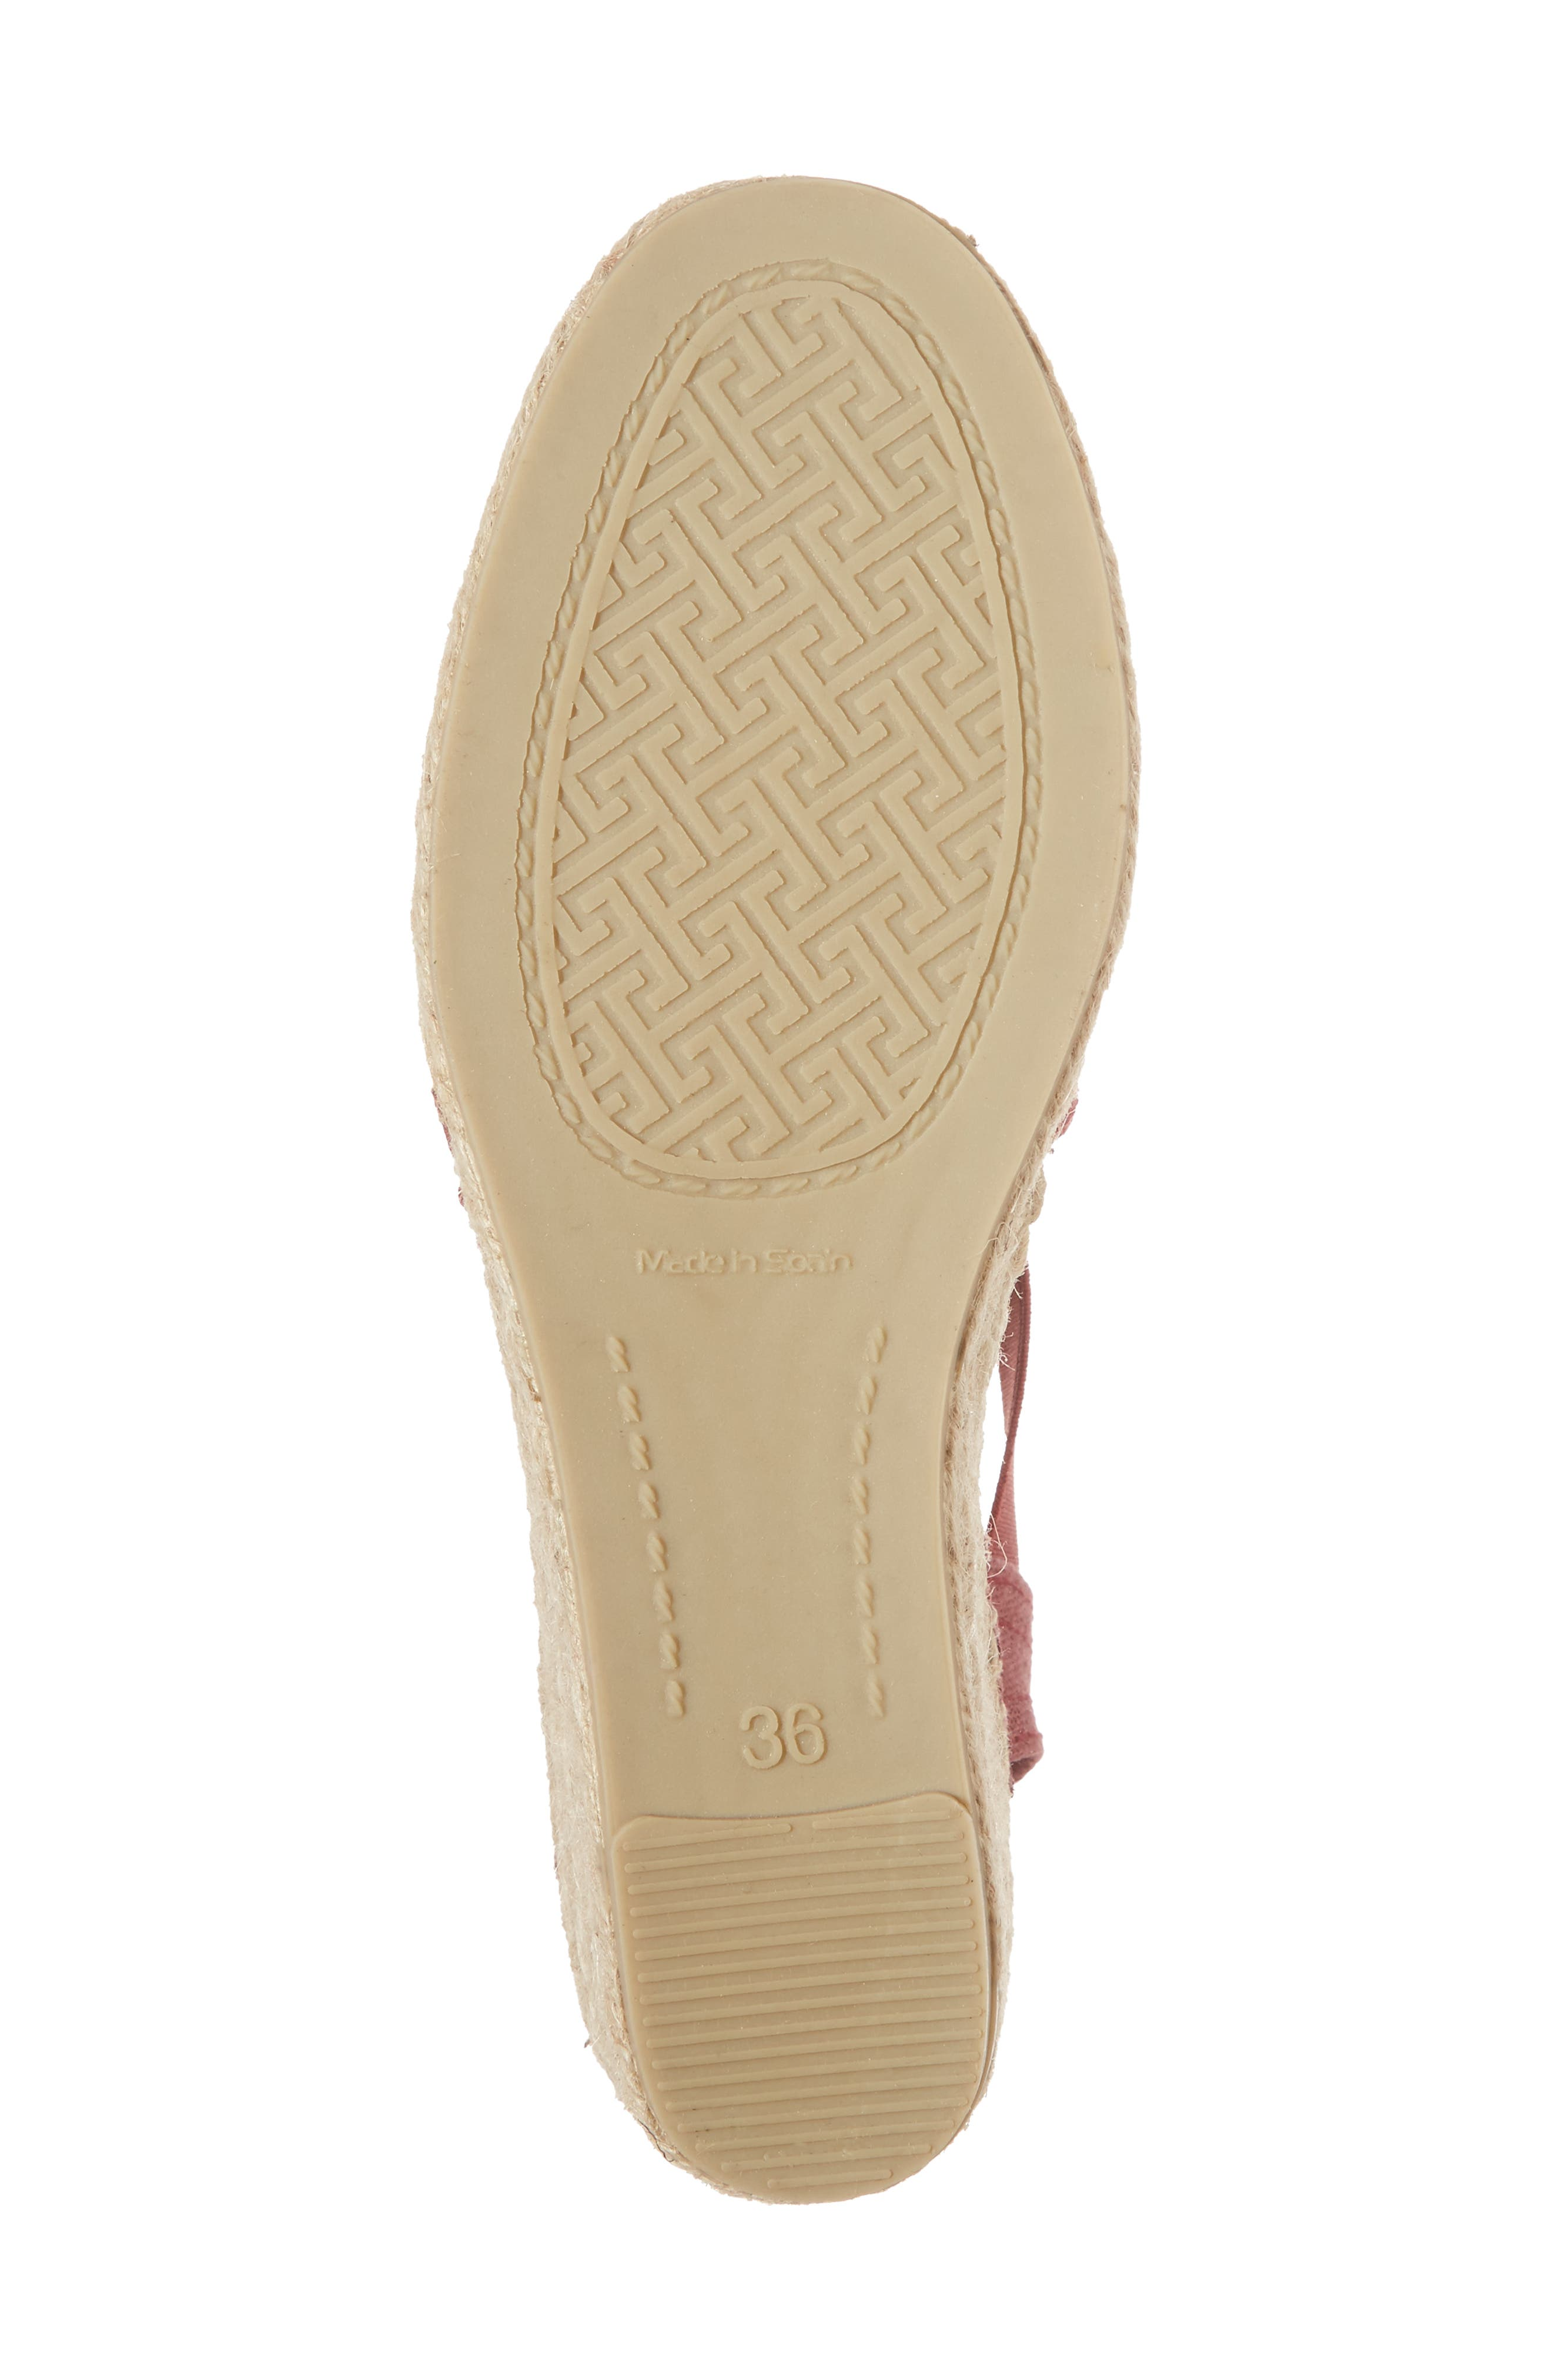 'Ter' Slingback Espadrille Sandal,                             Alternate thumbnail 6, color,                             Bru Fabric